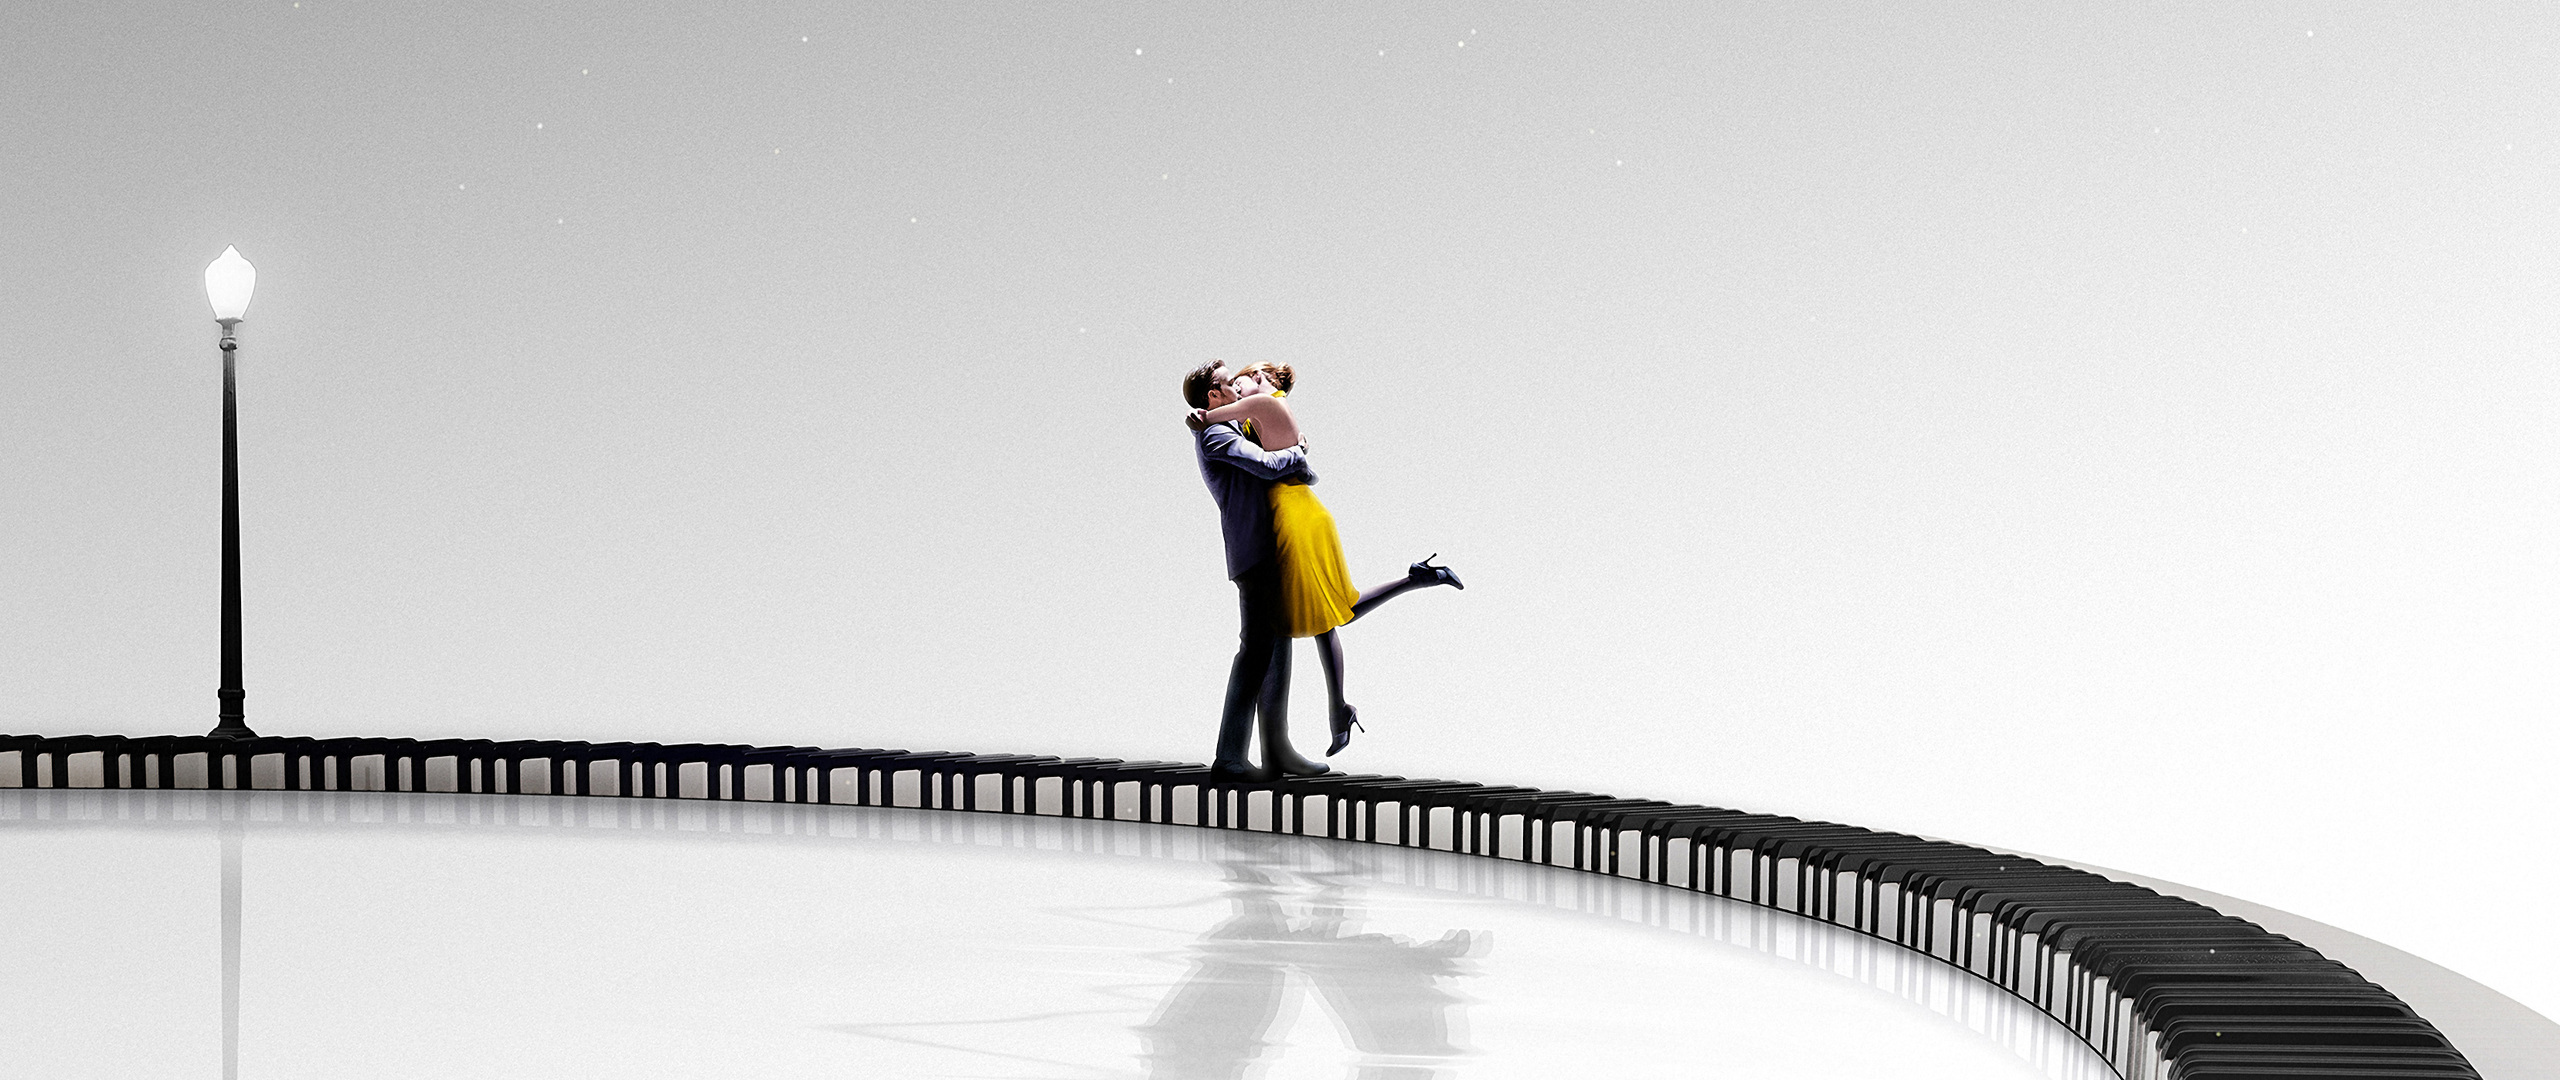 2560x1080 La La Land Emma Stone And Ryan Gosling Poster 2560x1080